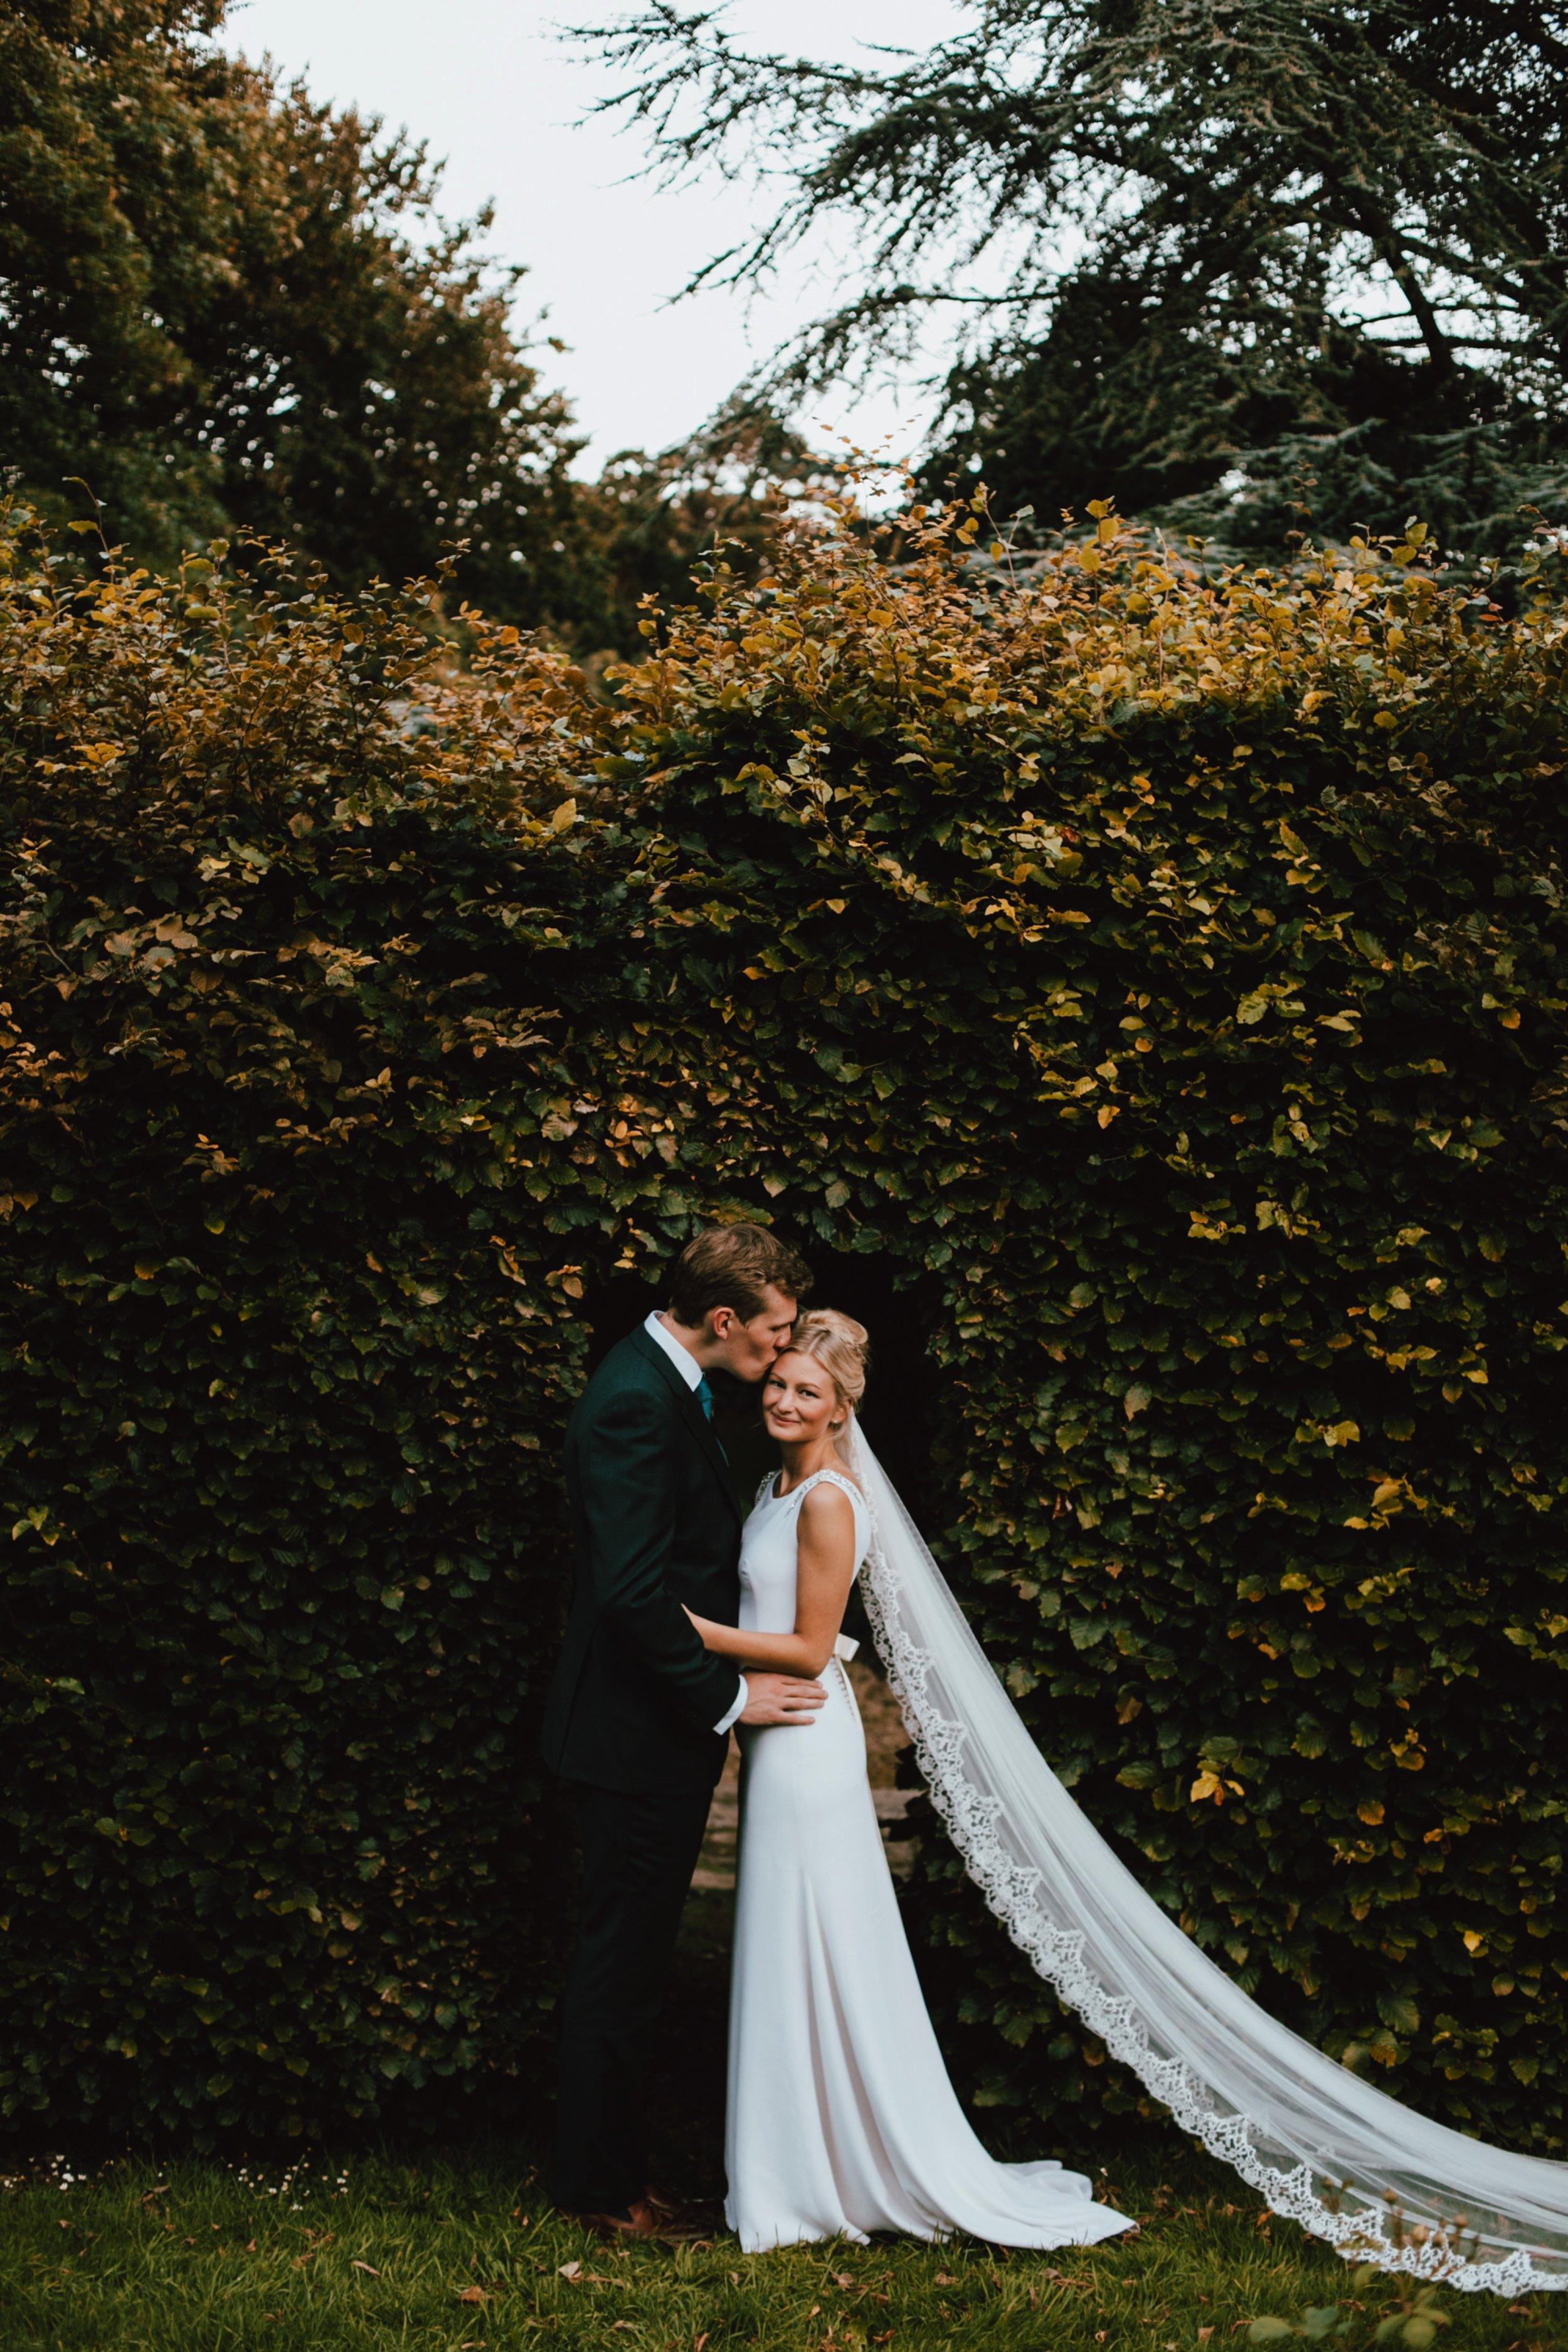 James & Hannah - Oak & Blossom0012.jpg